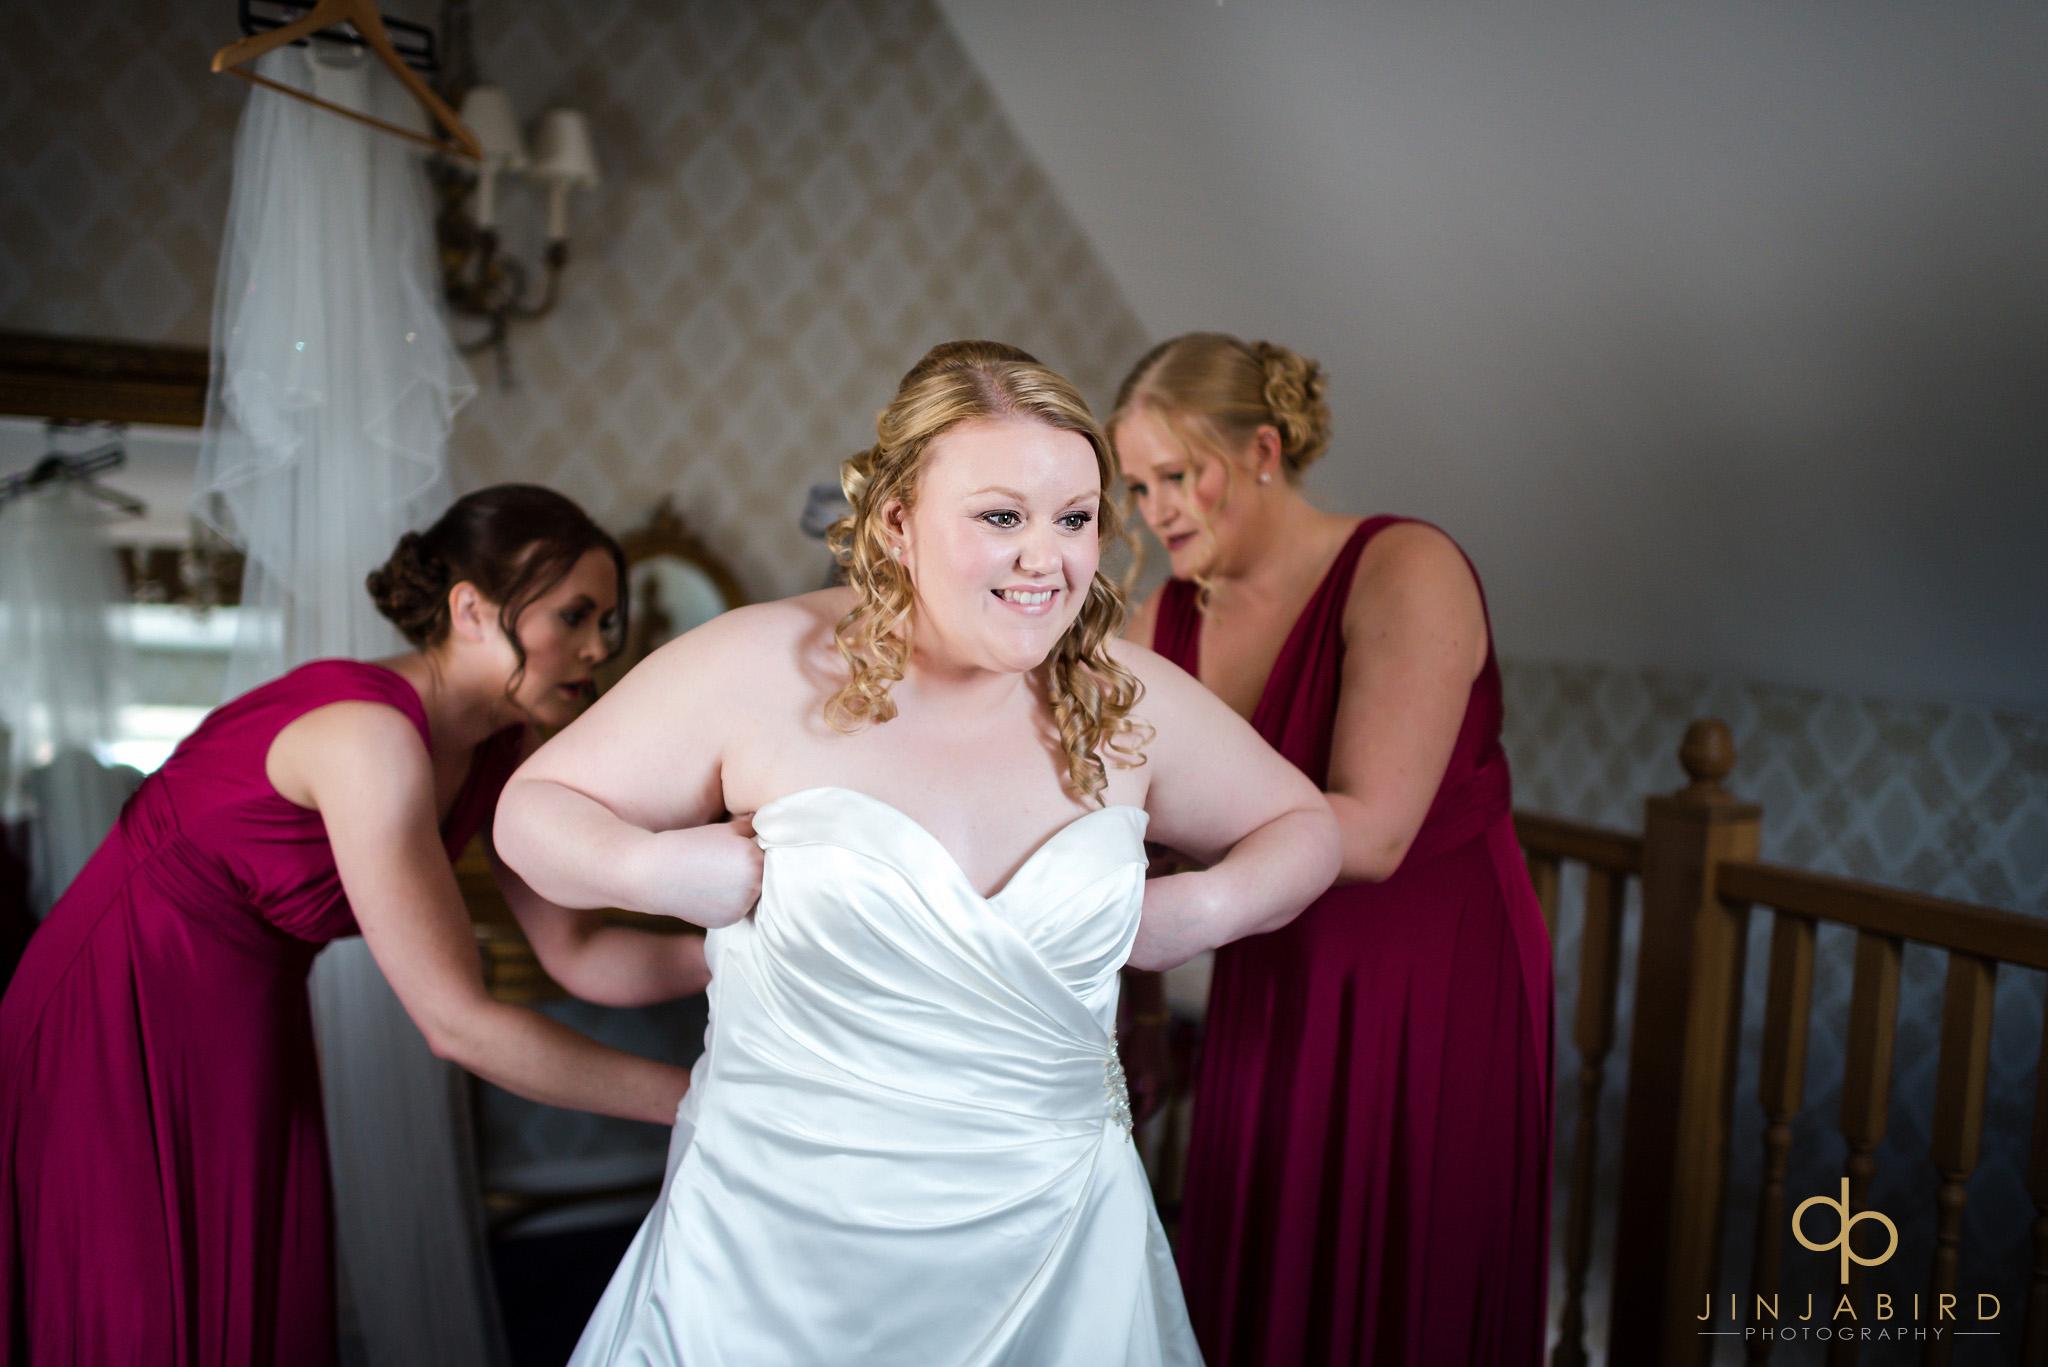 bridesmaids helping bride in dress